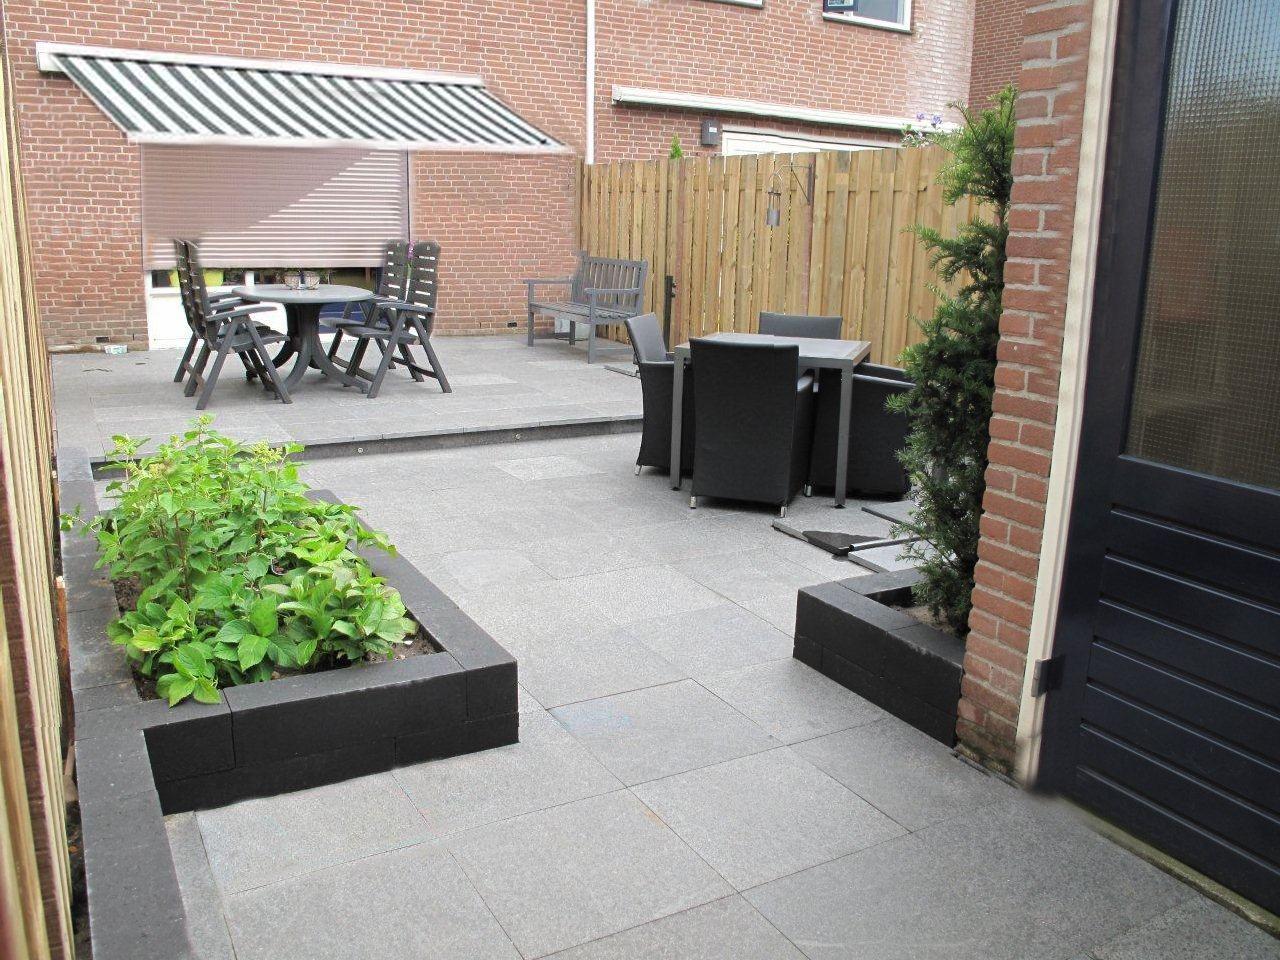 60x60 Tegels Tuin : Lichtgrijze tegels met antraciete borders mooi tuin